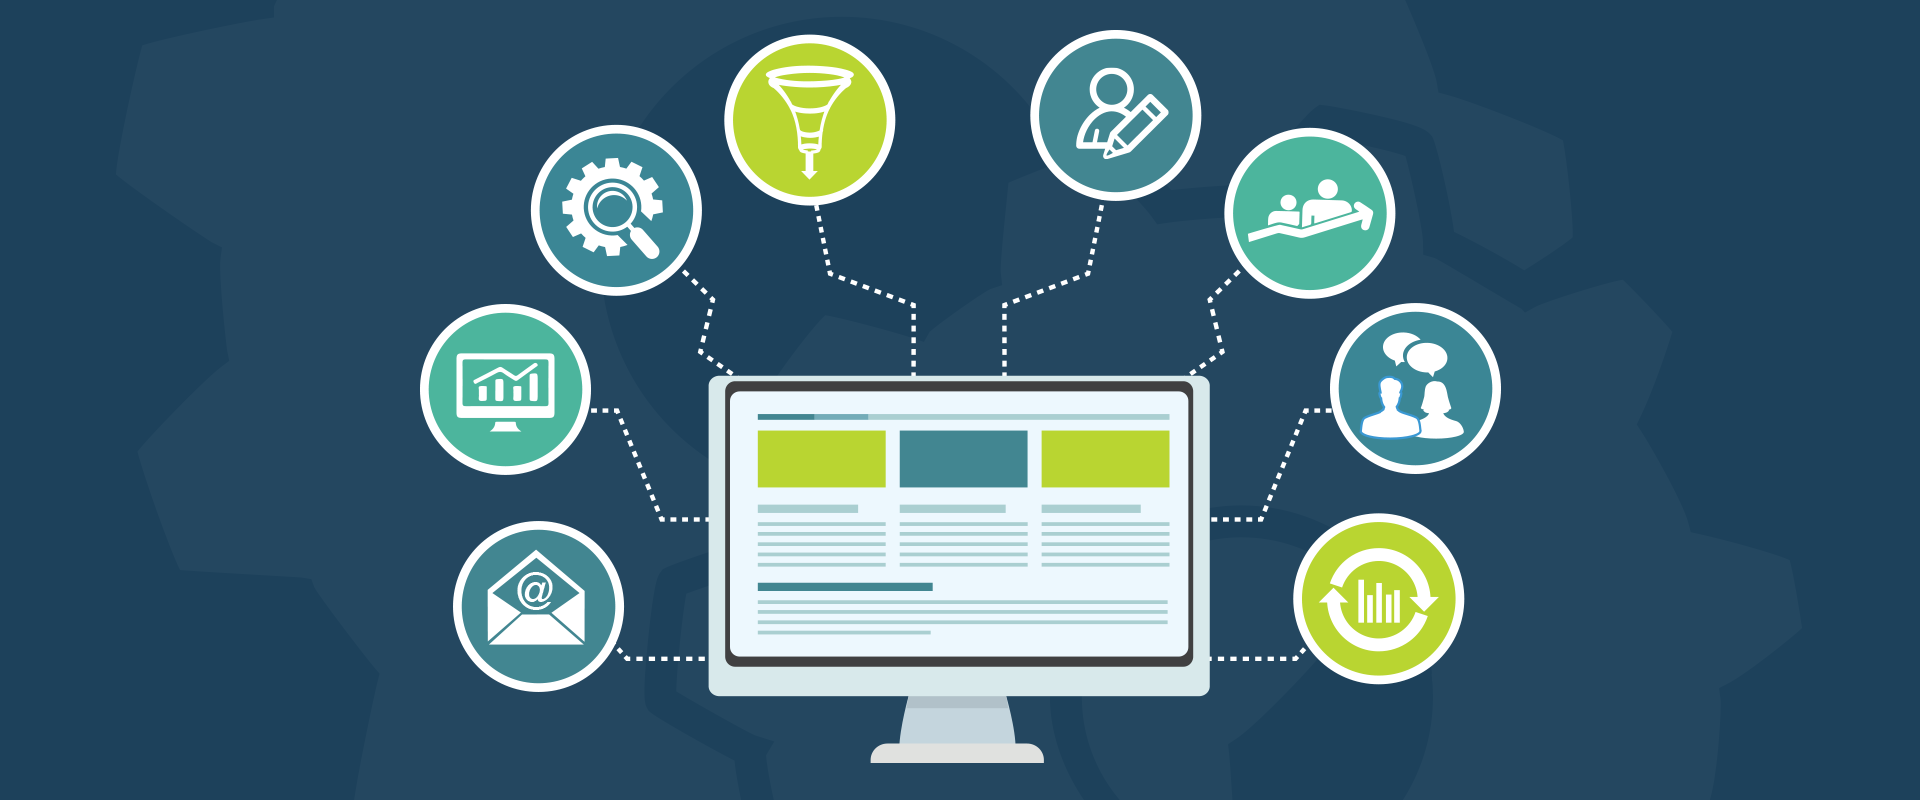 digital marketing gồm 7 loại chính